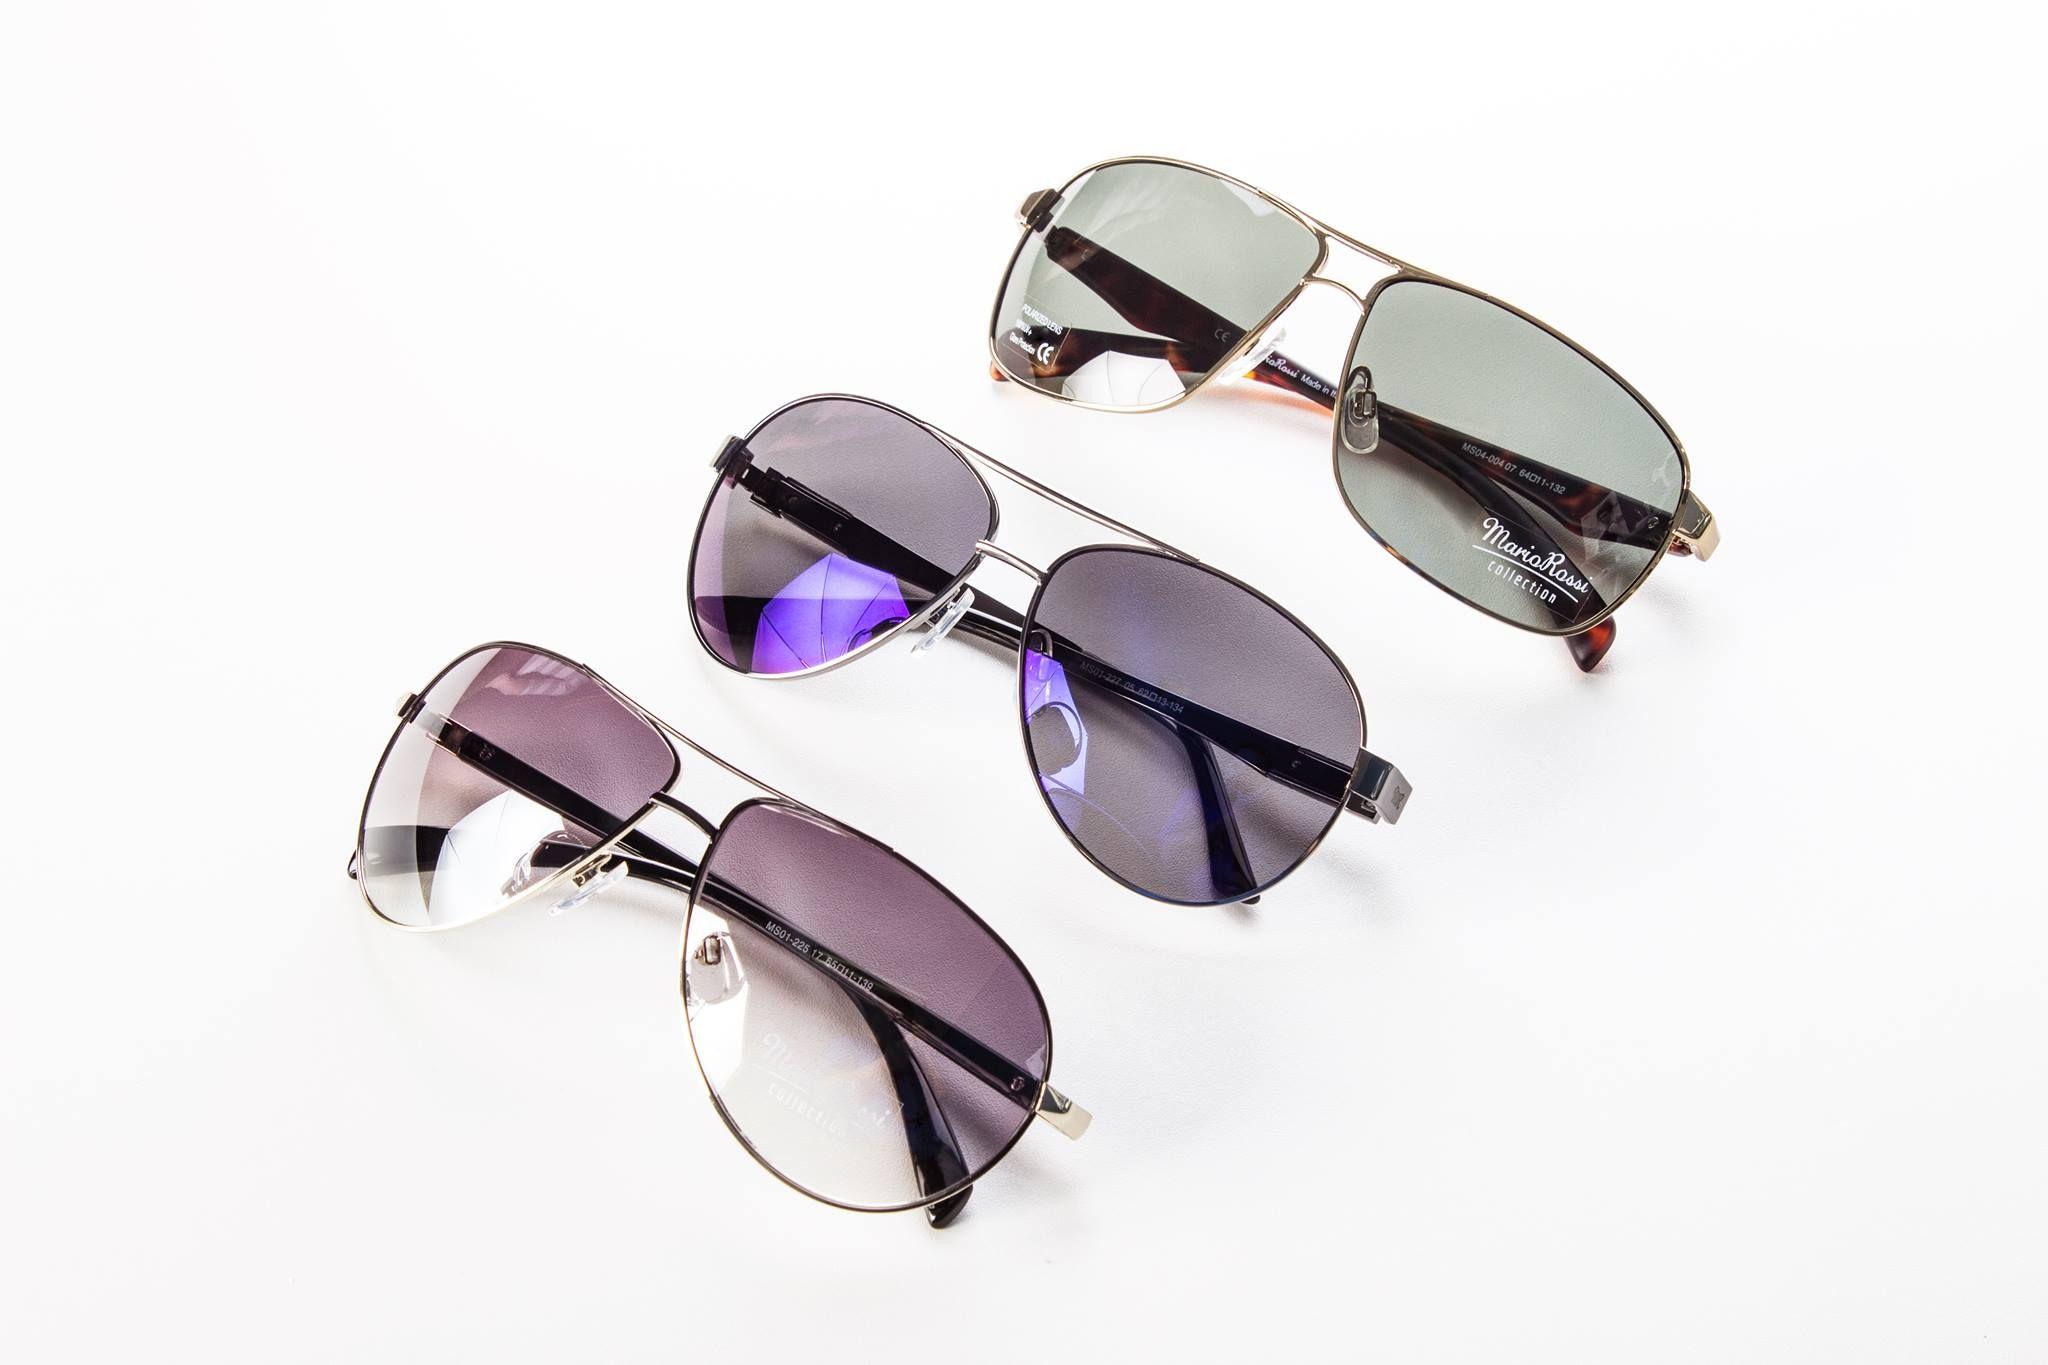 db95d7ee7a Aviator sunglasses. Mario Rossi | Sunglasses